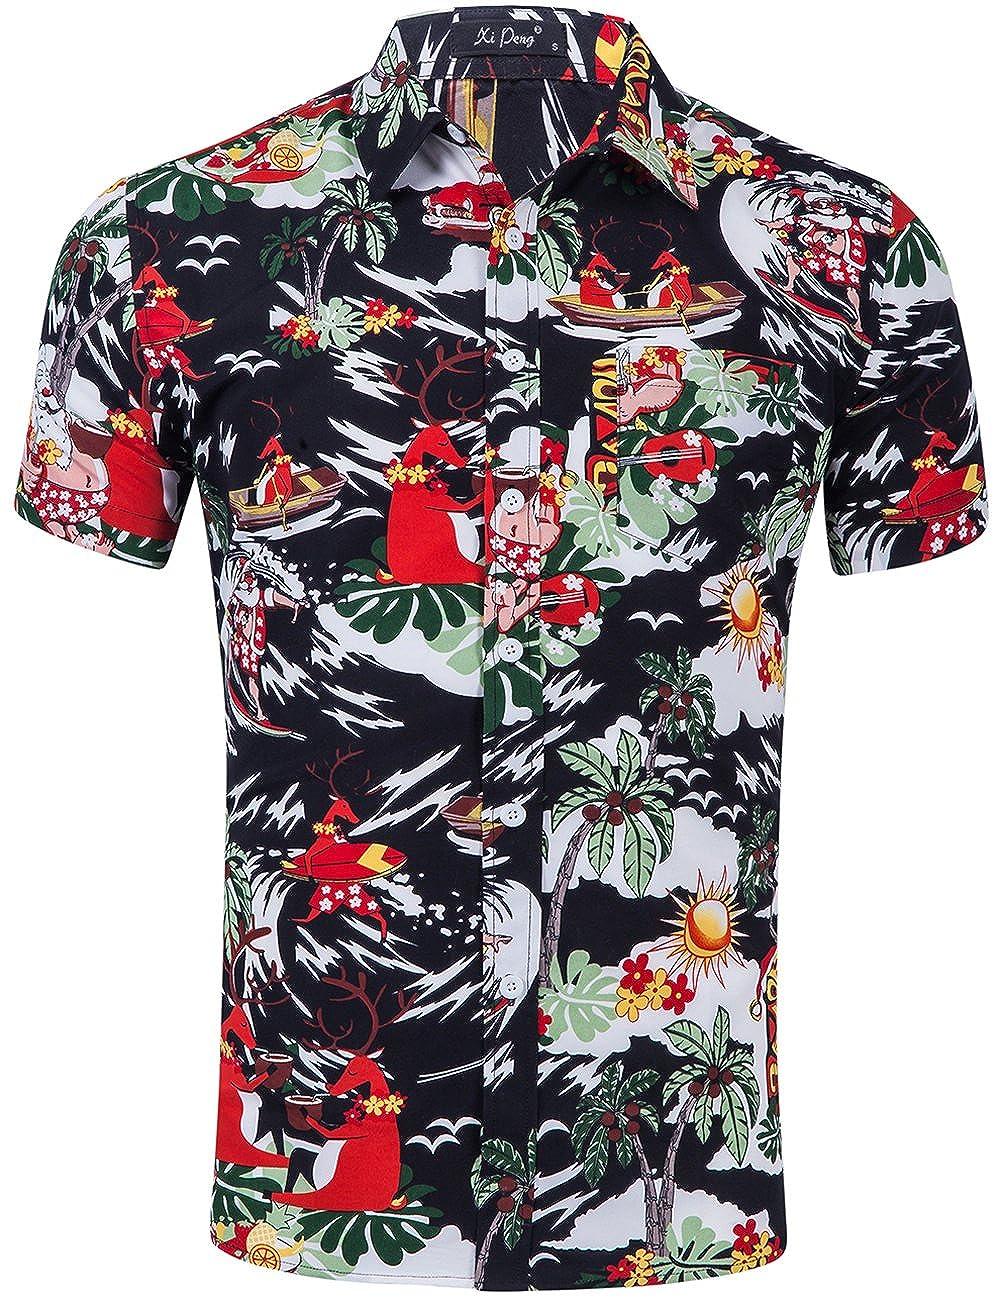 a5ed103d DESIGN:Summer Tropical Men's Casual Button Up Flamingo Hibiscus Christmas  Caribbean Attire Beach Aloha Hawaiian Shirts(Floral  Hibiscus/Flamingo/Coconut ...